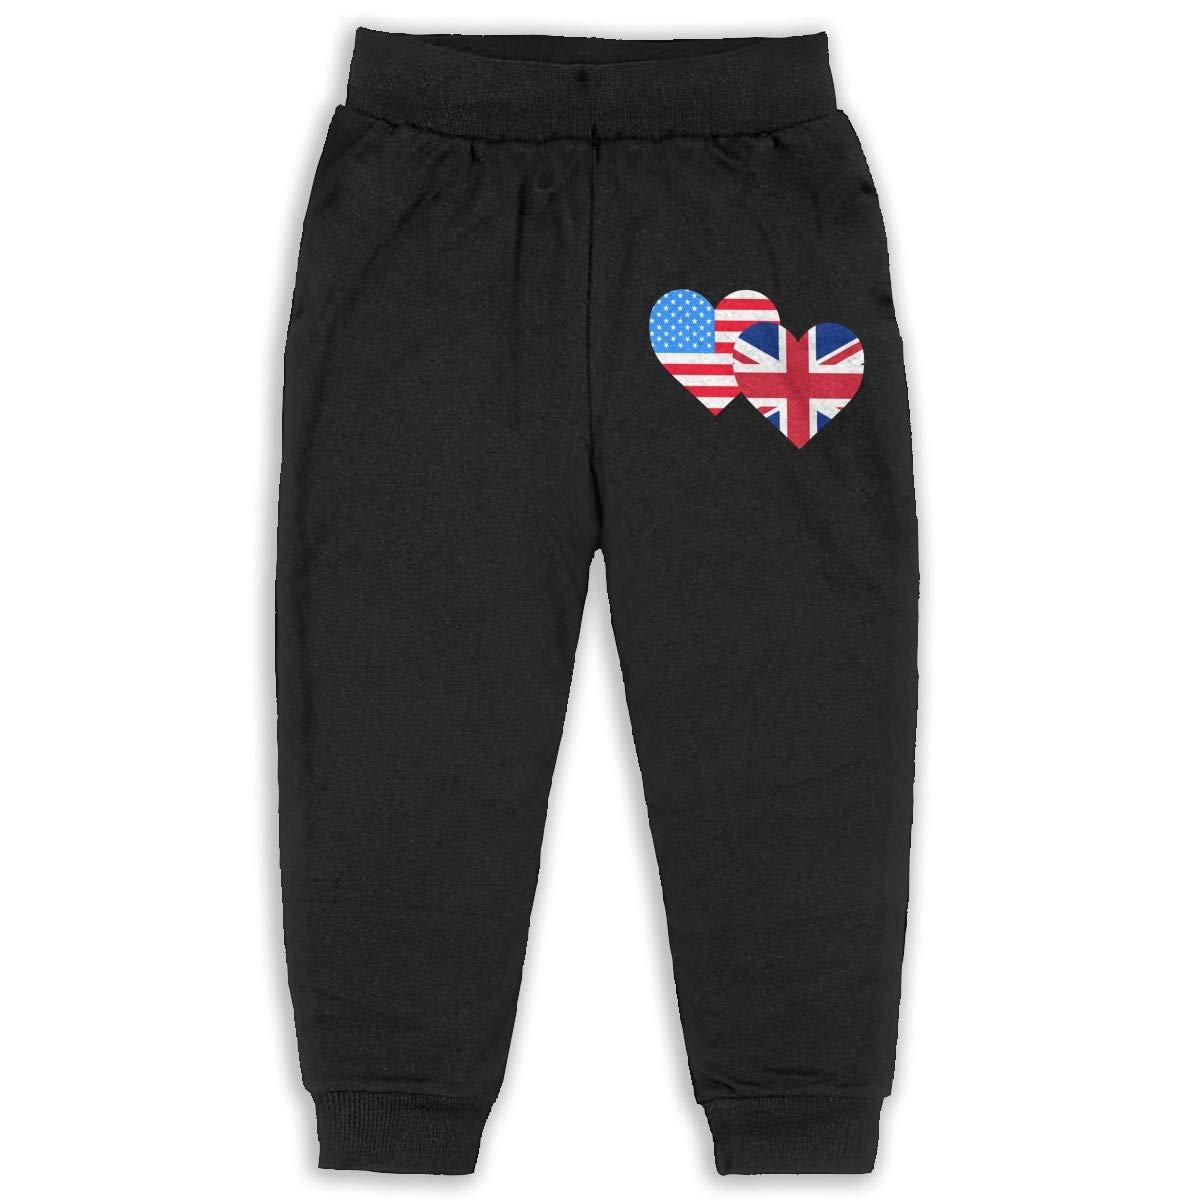 Sicilia Pride Fleece Pants Sports Pants ELCW37K Kids /& Toddler Pants Soft Cozy Baby Sweatpants Sicilian Trinacria